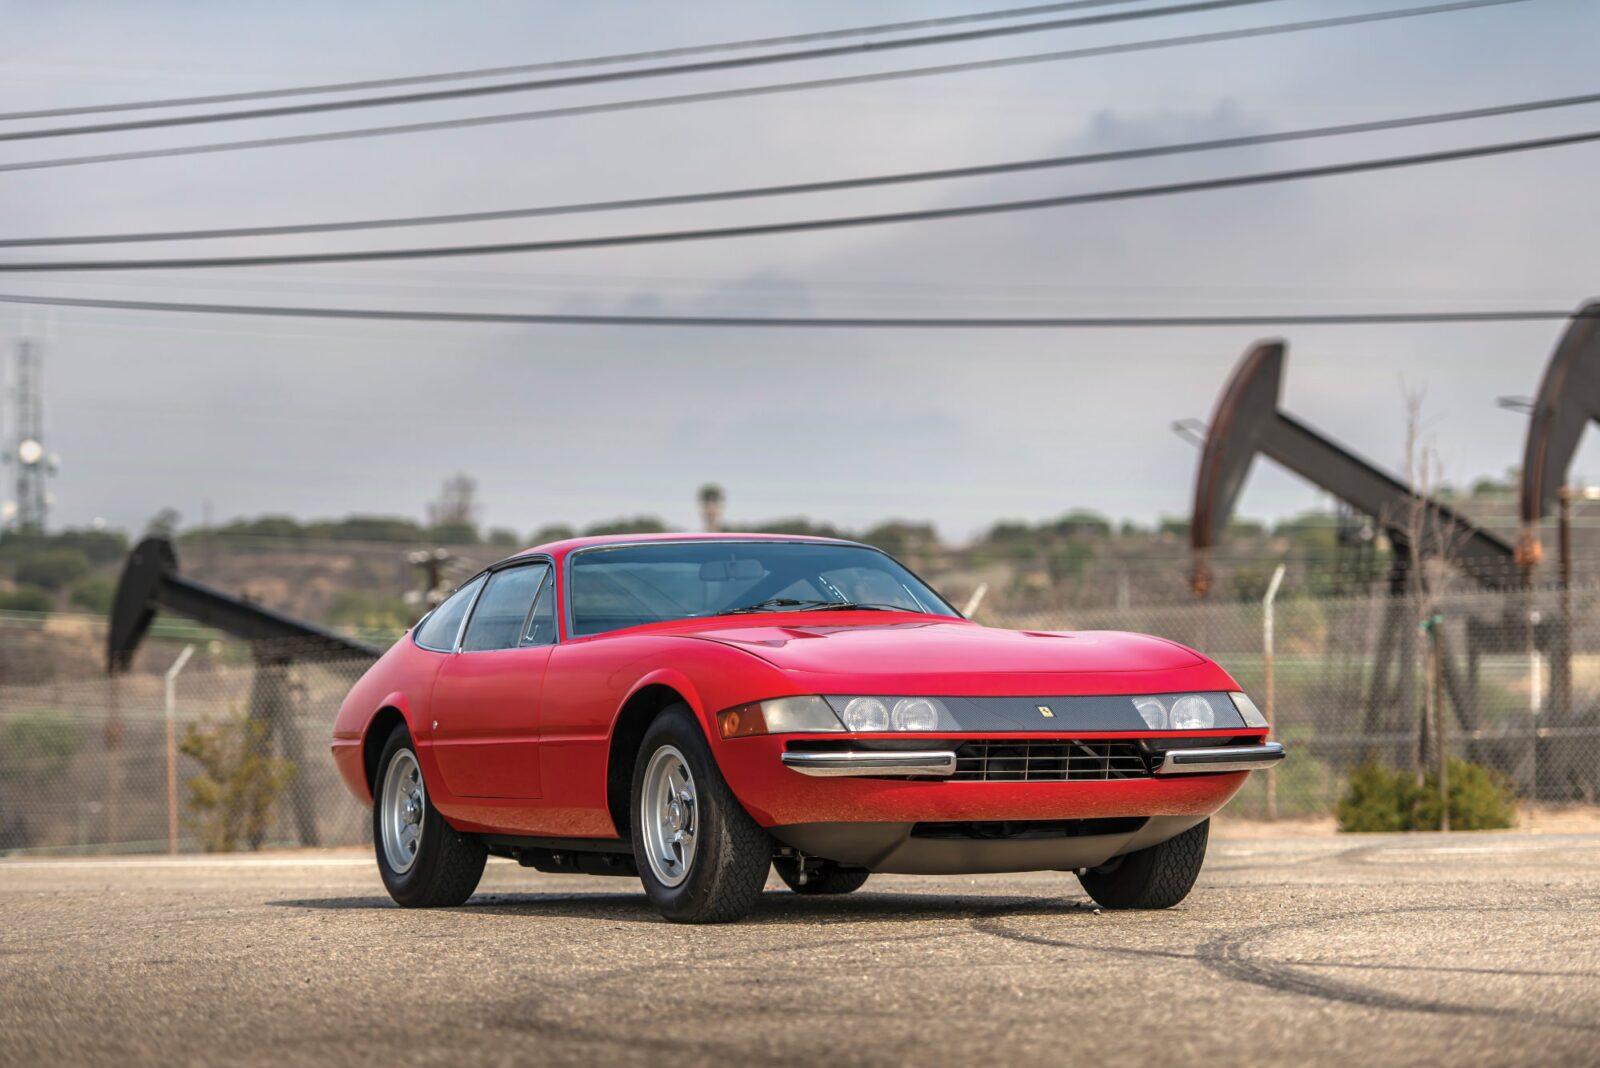 Ferrari 365 gtb4 daytona 1 1600x1068 - 1970 Ferrari 365 GTB/4 Daytona